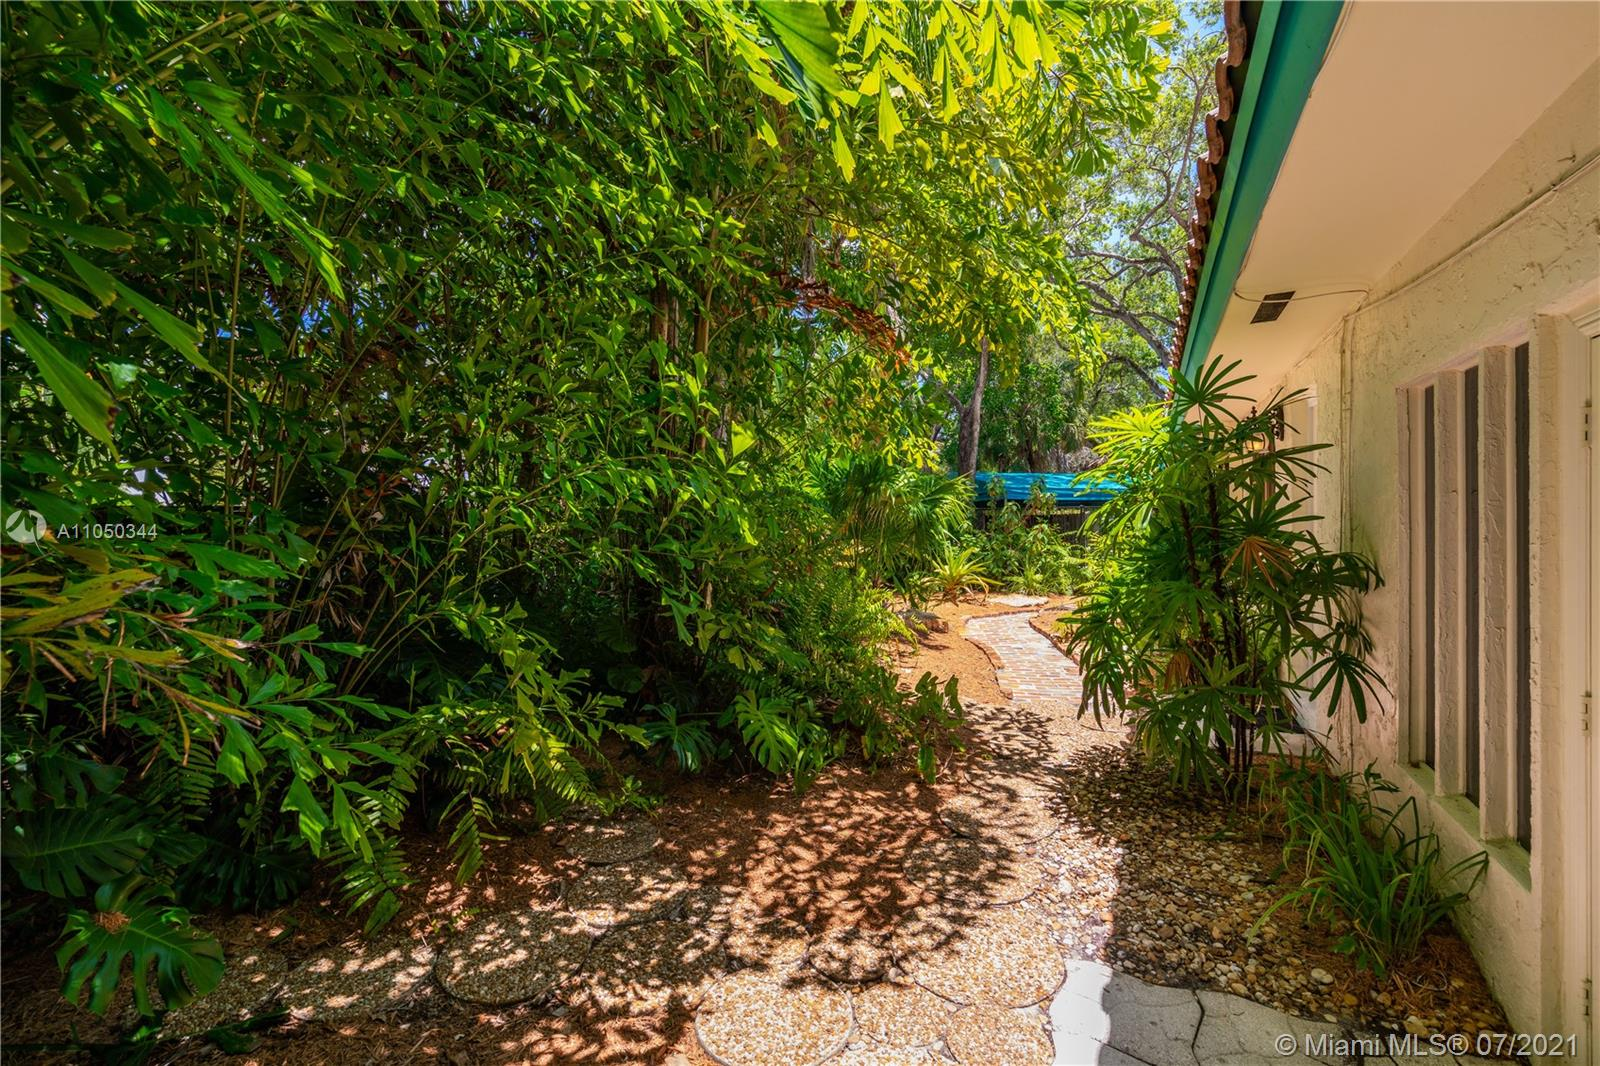 3701 Poinciana ave- coconut-grove-fl-33133-a11050344-Pic01